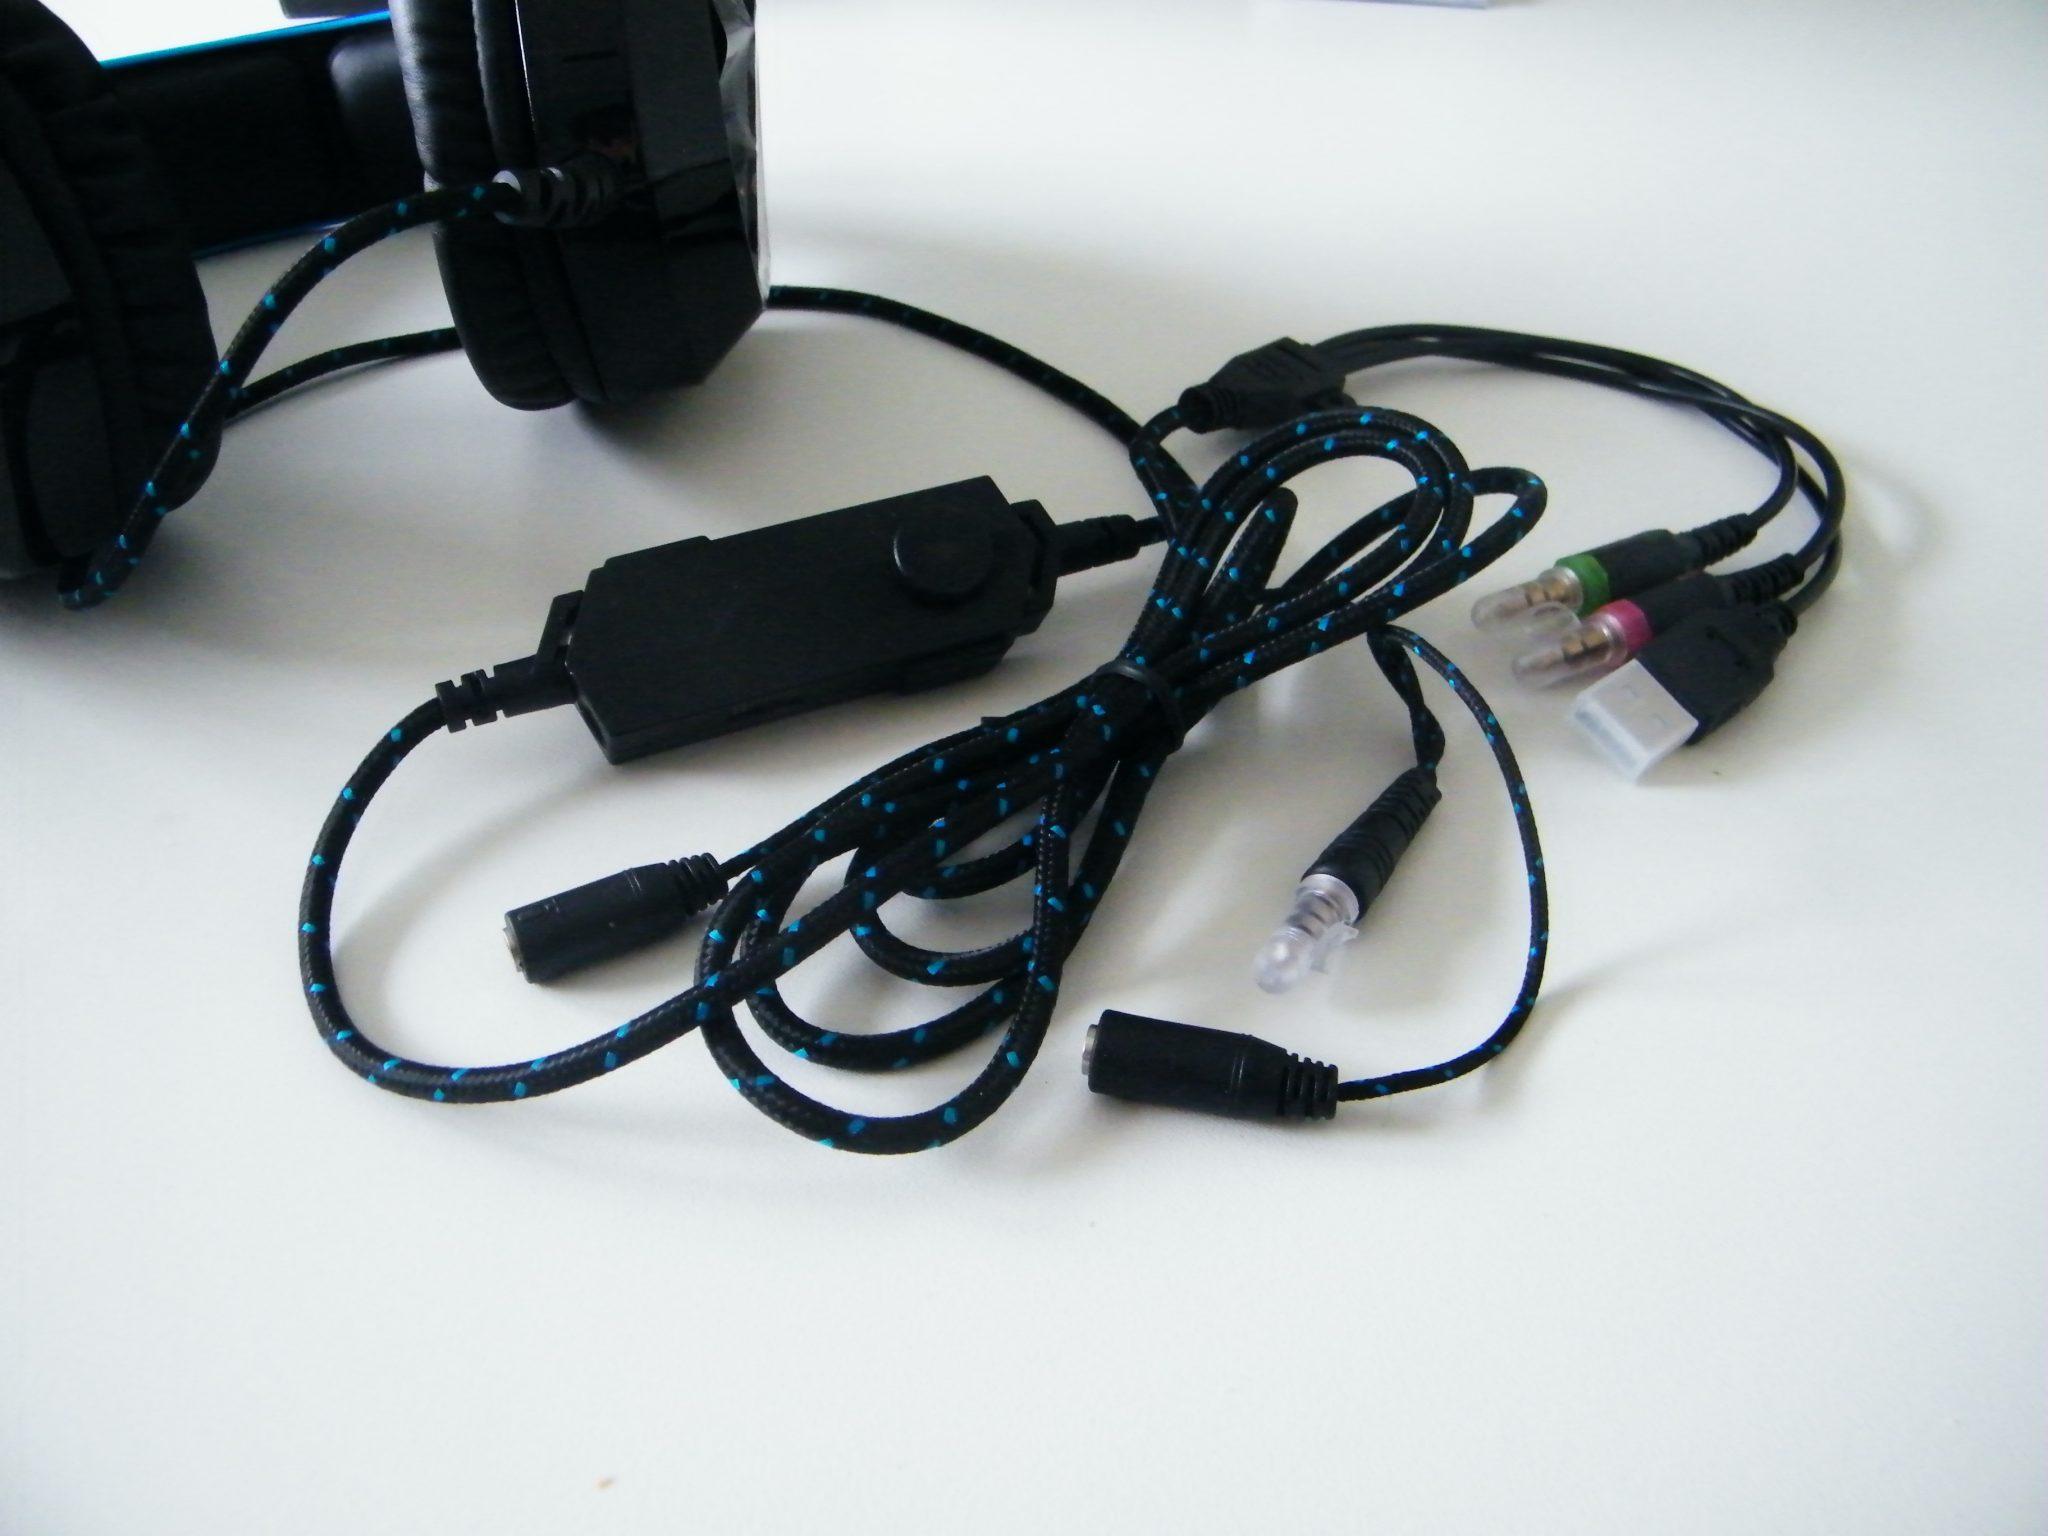 EasySMX K5 Dettaglio cavi